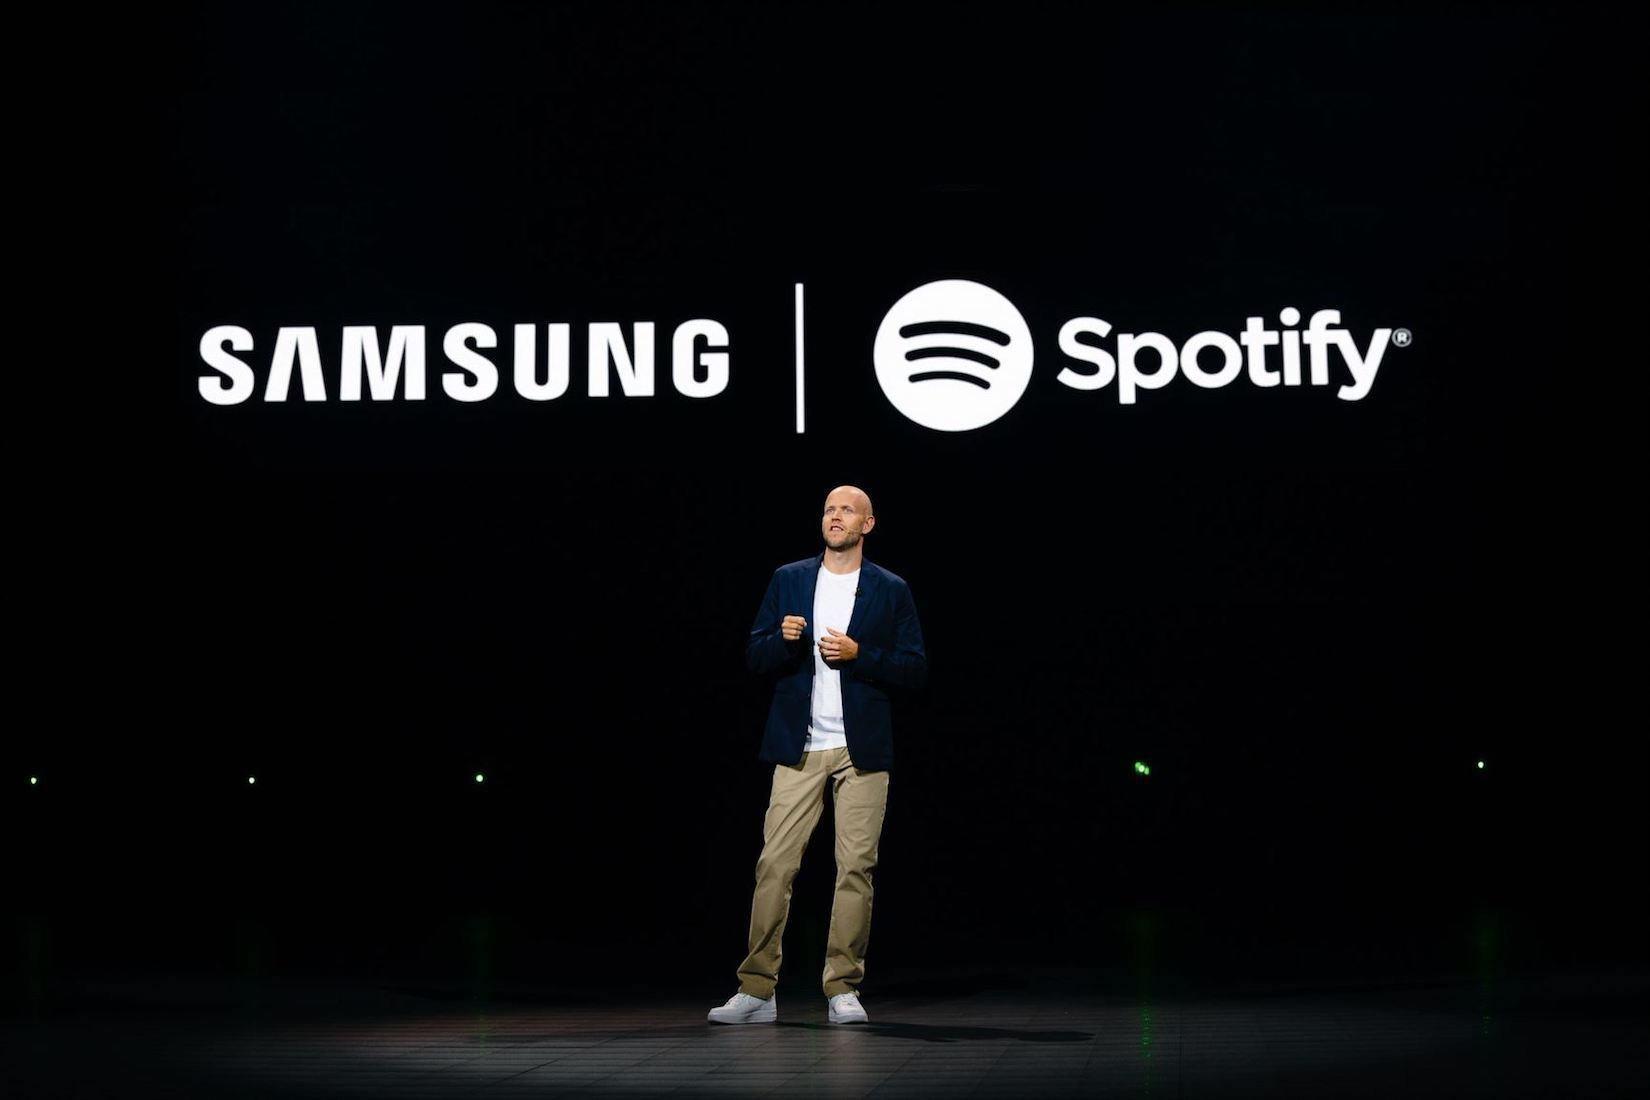 alarme spotify, Samsung One UI 2.1 – Utilisez Spotify comme alarme